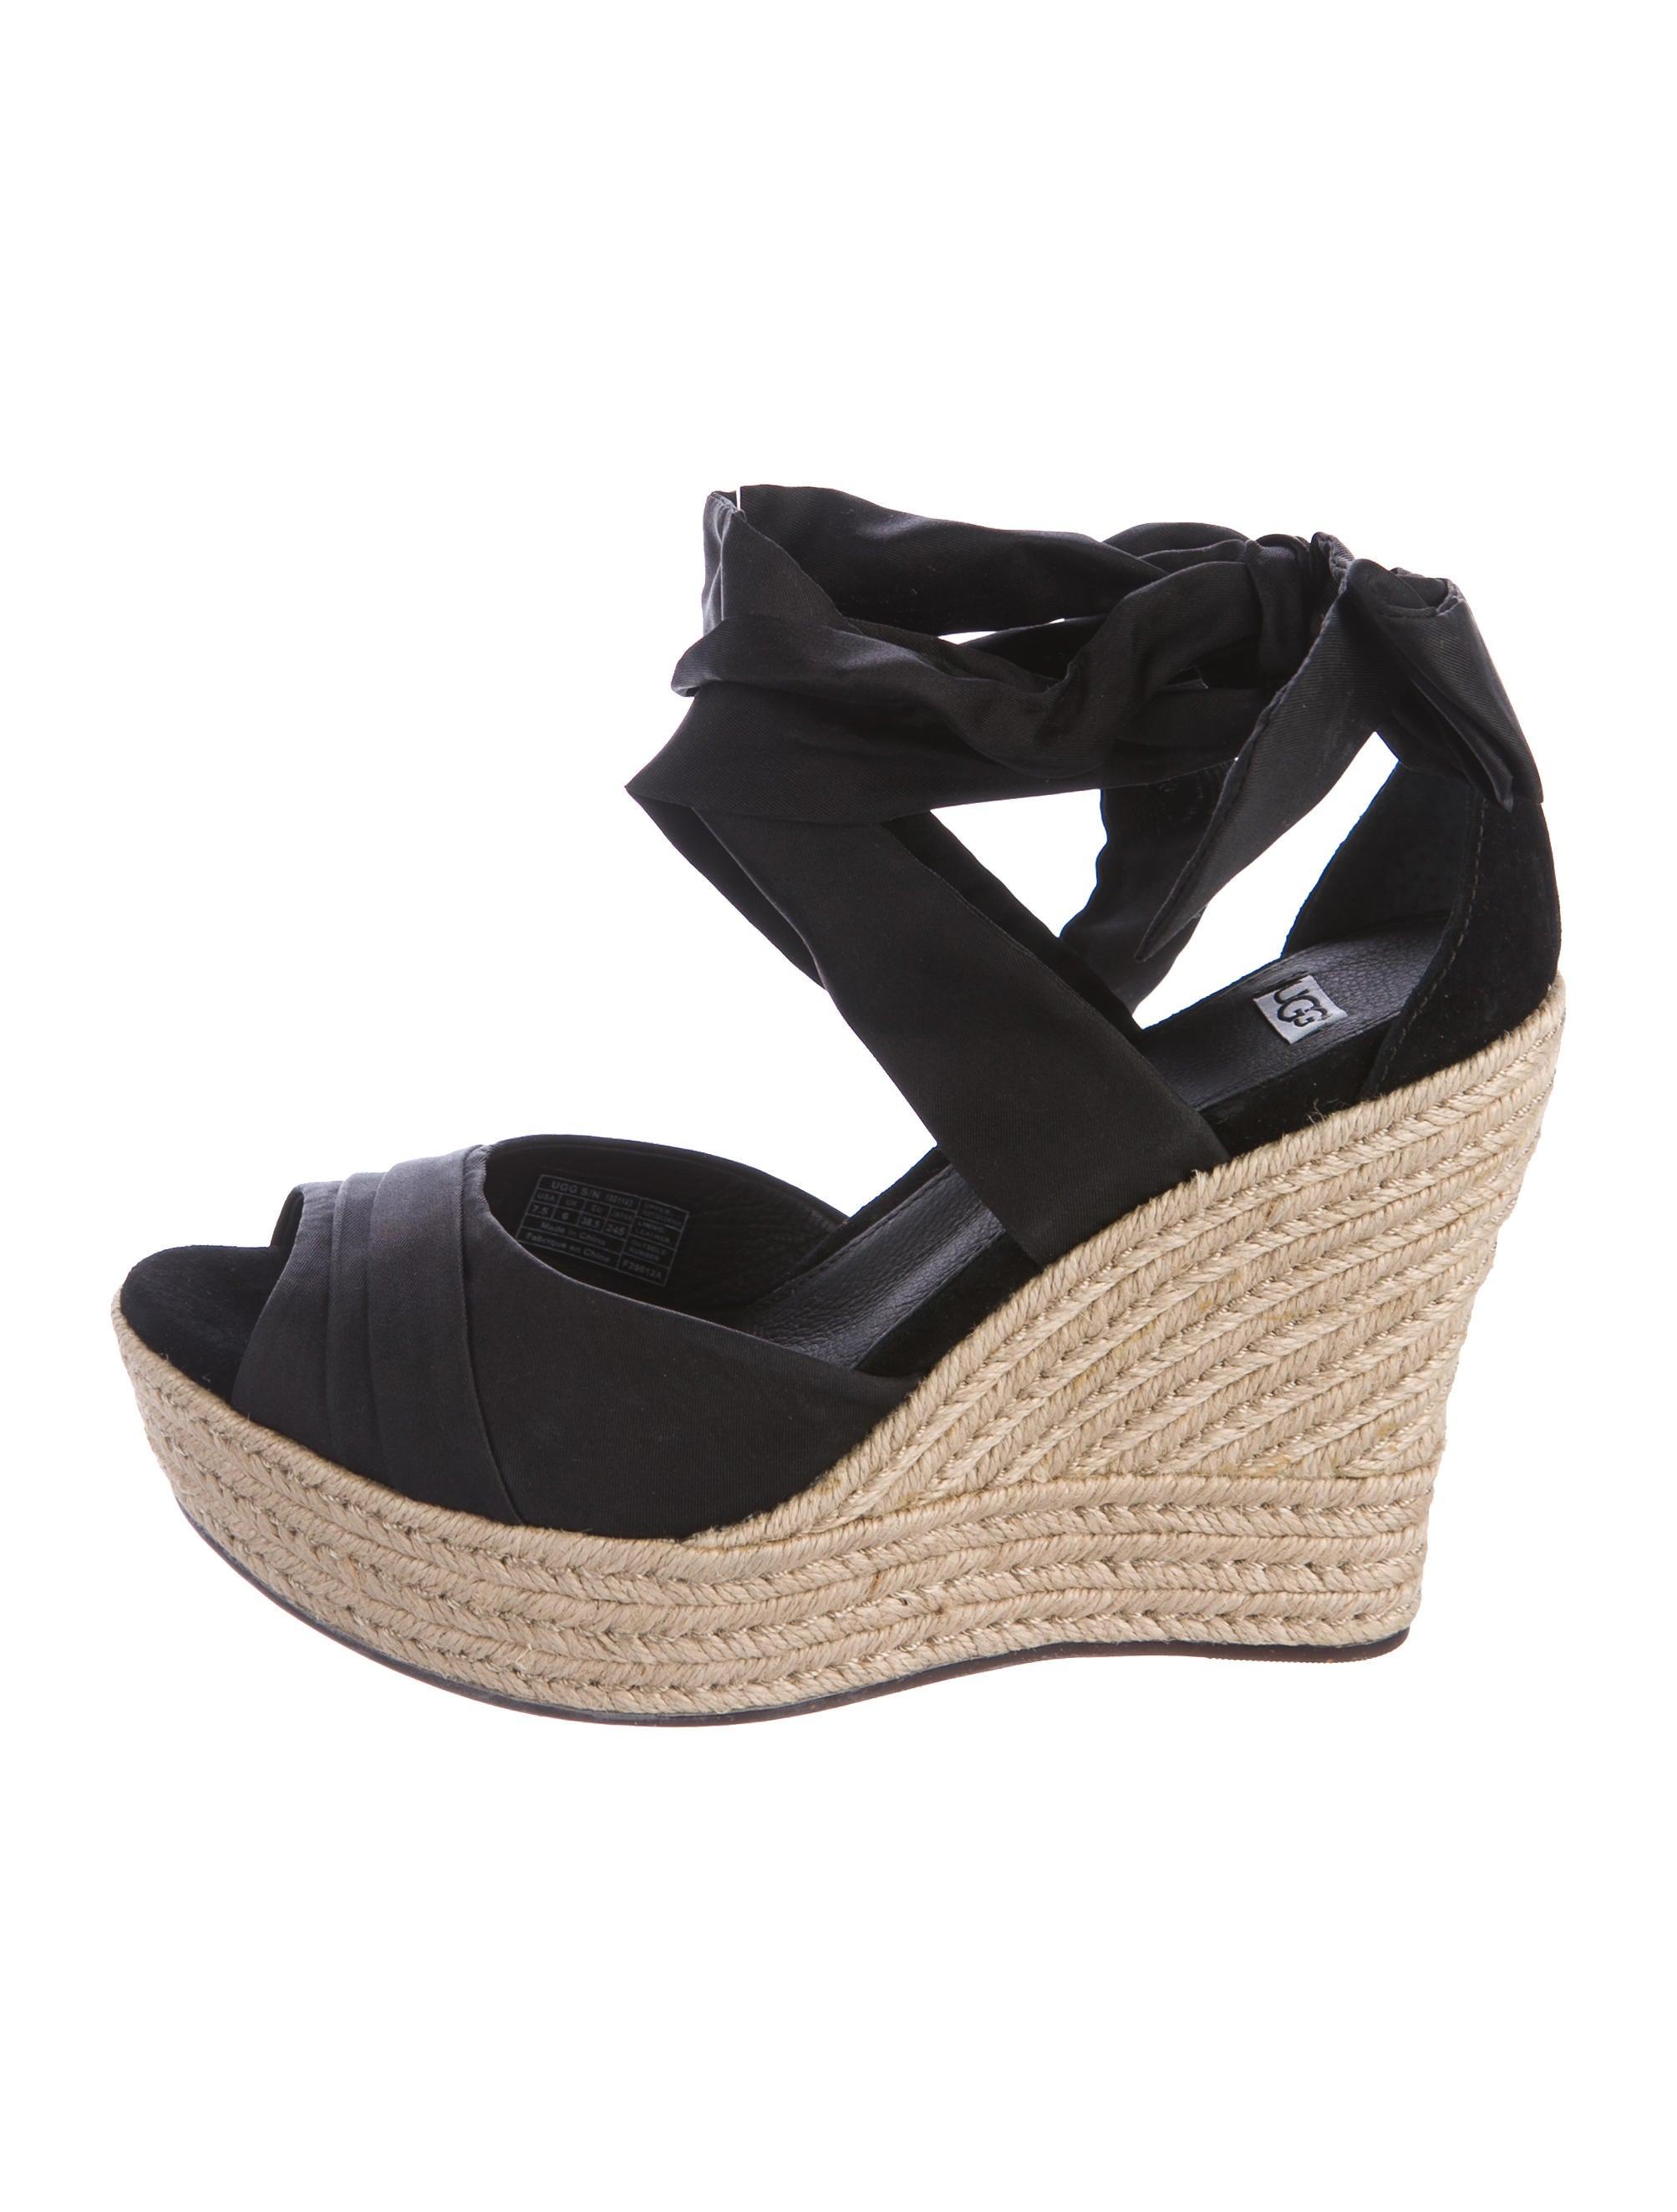 ugg australia platform wedge sandals shoes wuugg23498